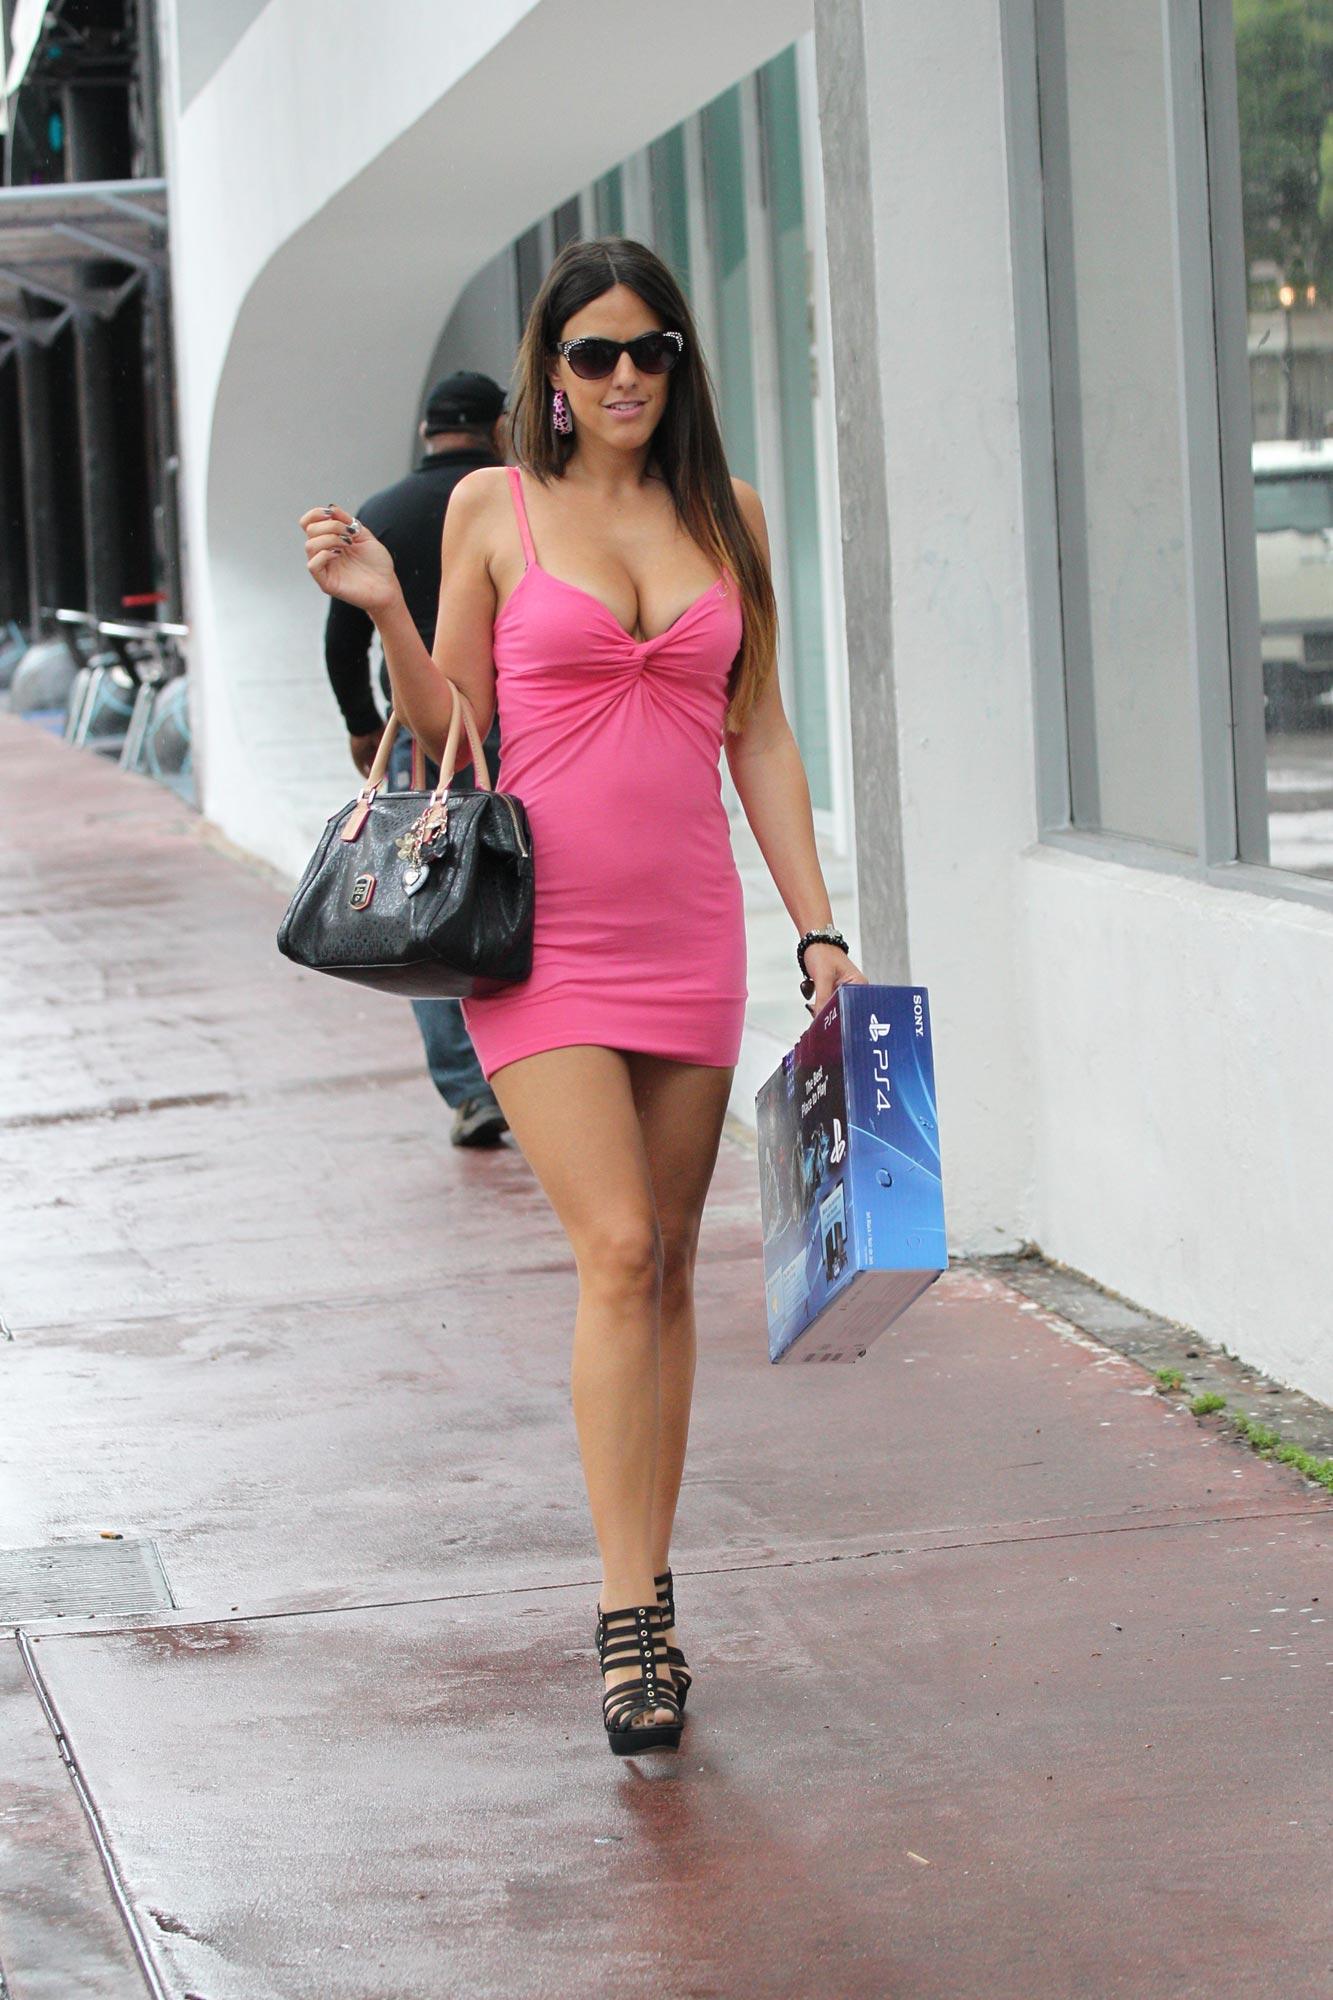 Claudia Romani Street Style - Shopping in Miami - November ... | 1333 x 2000 jpeg 283kB